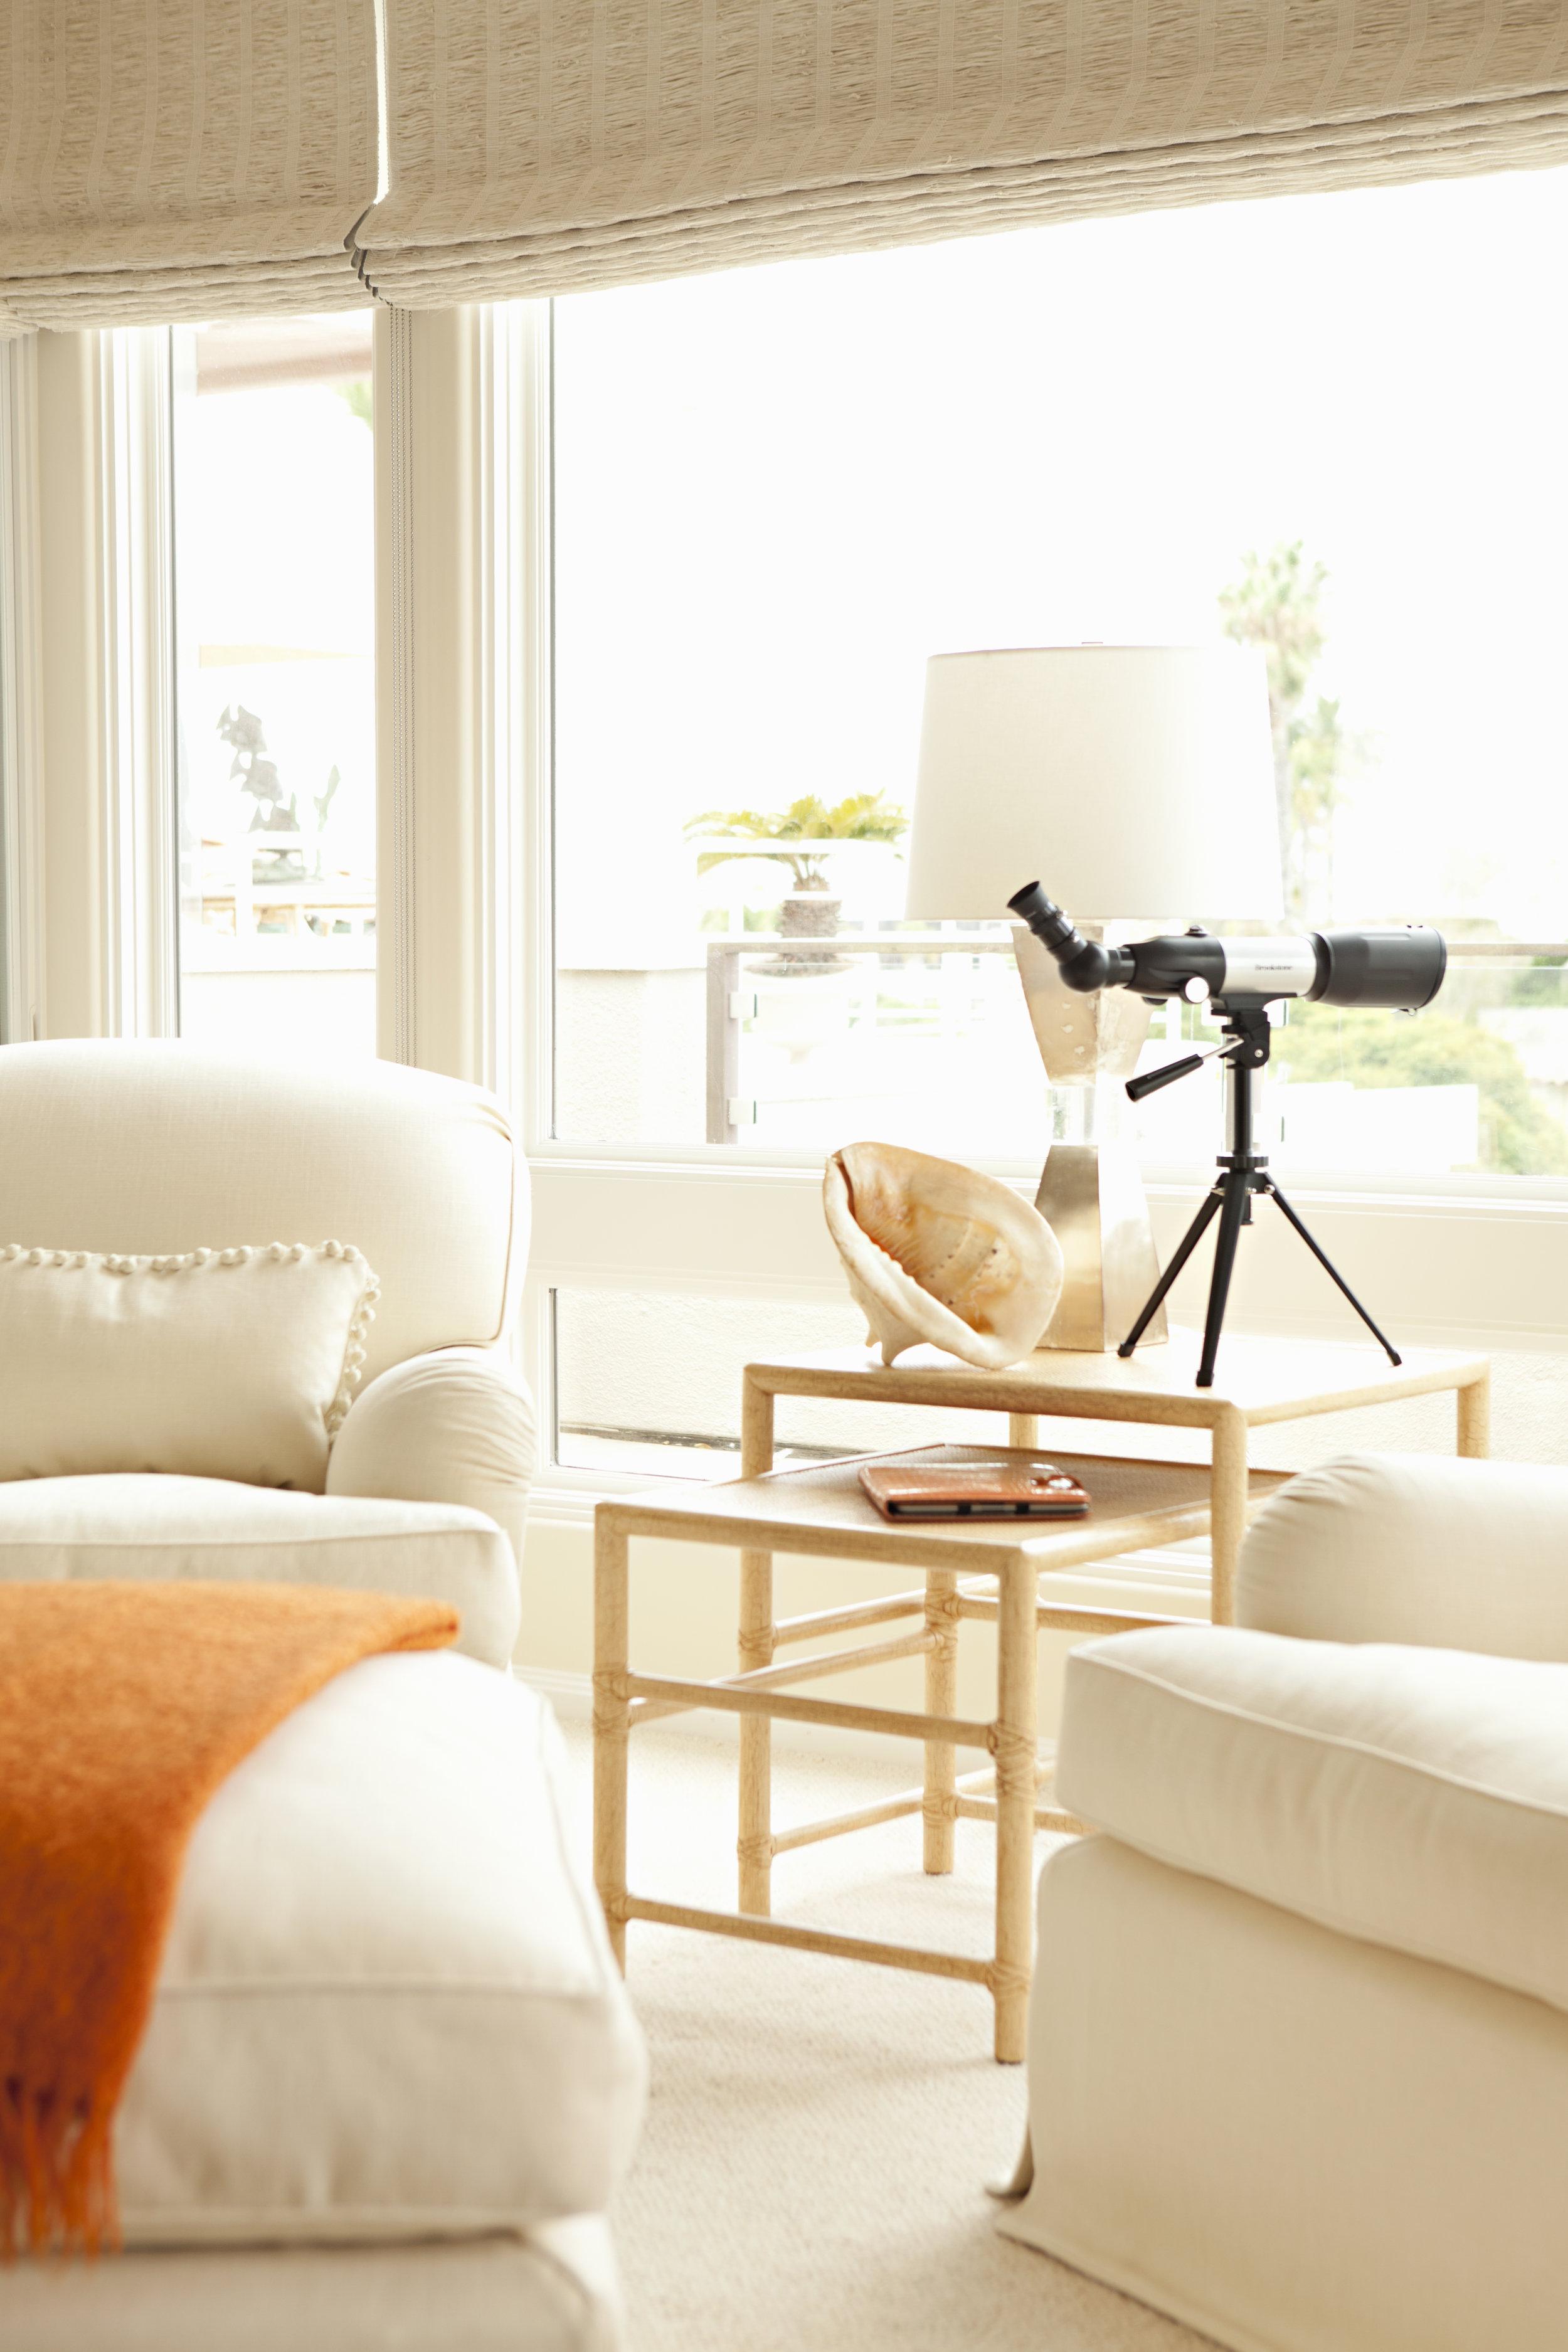 KLEIN - LA JOLLA_MASTER BEDROOM 3.jpg